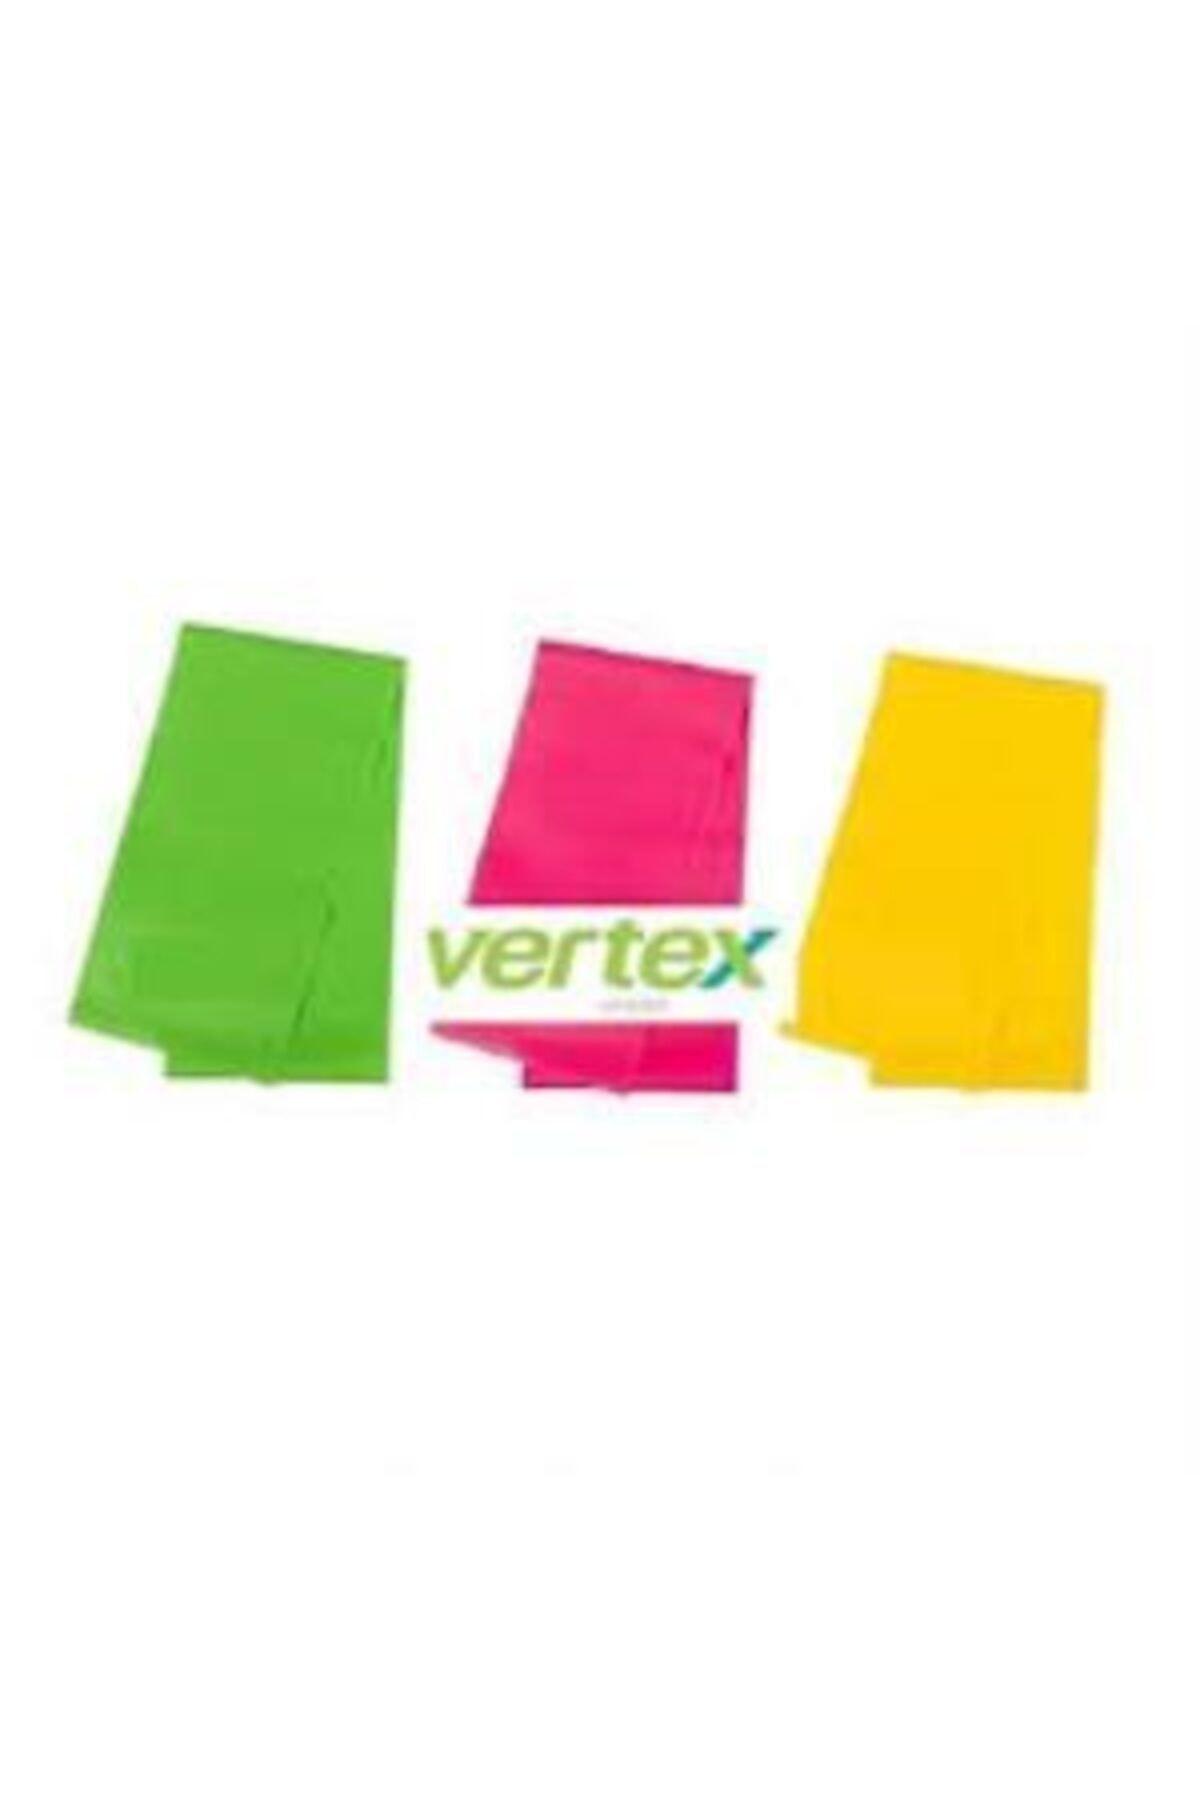 VERTEX Pilates Lastiği 1 Adet - Kırmızı 1